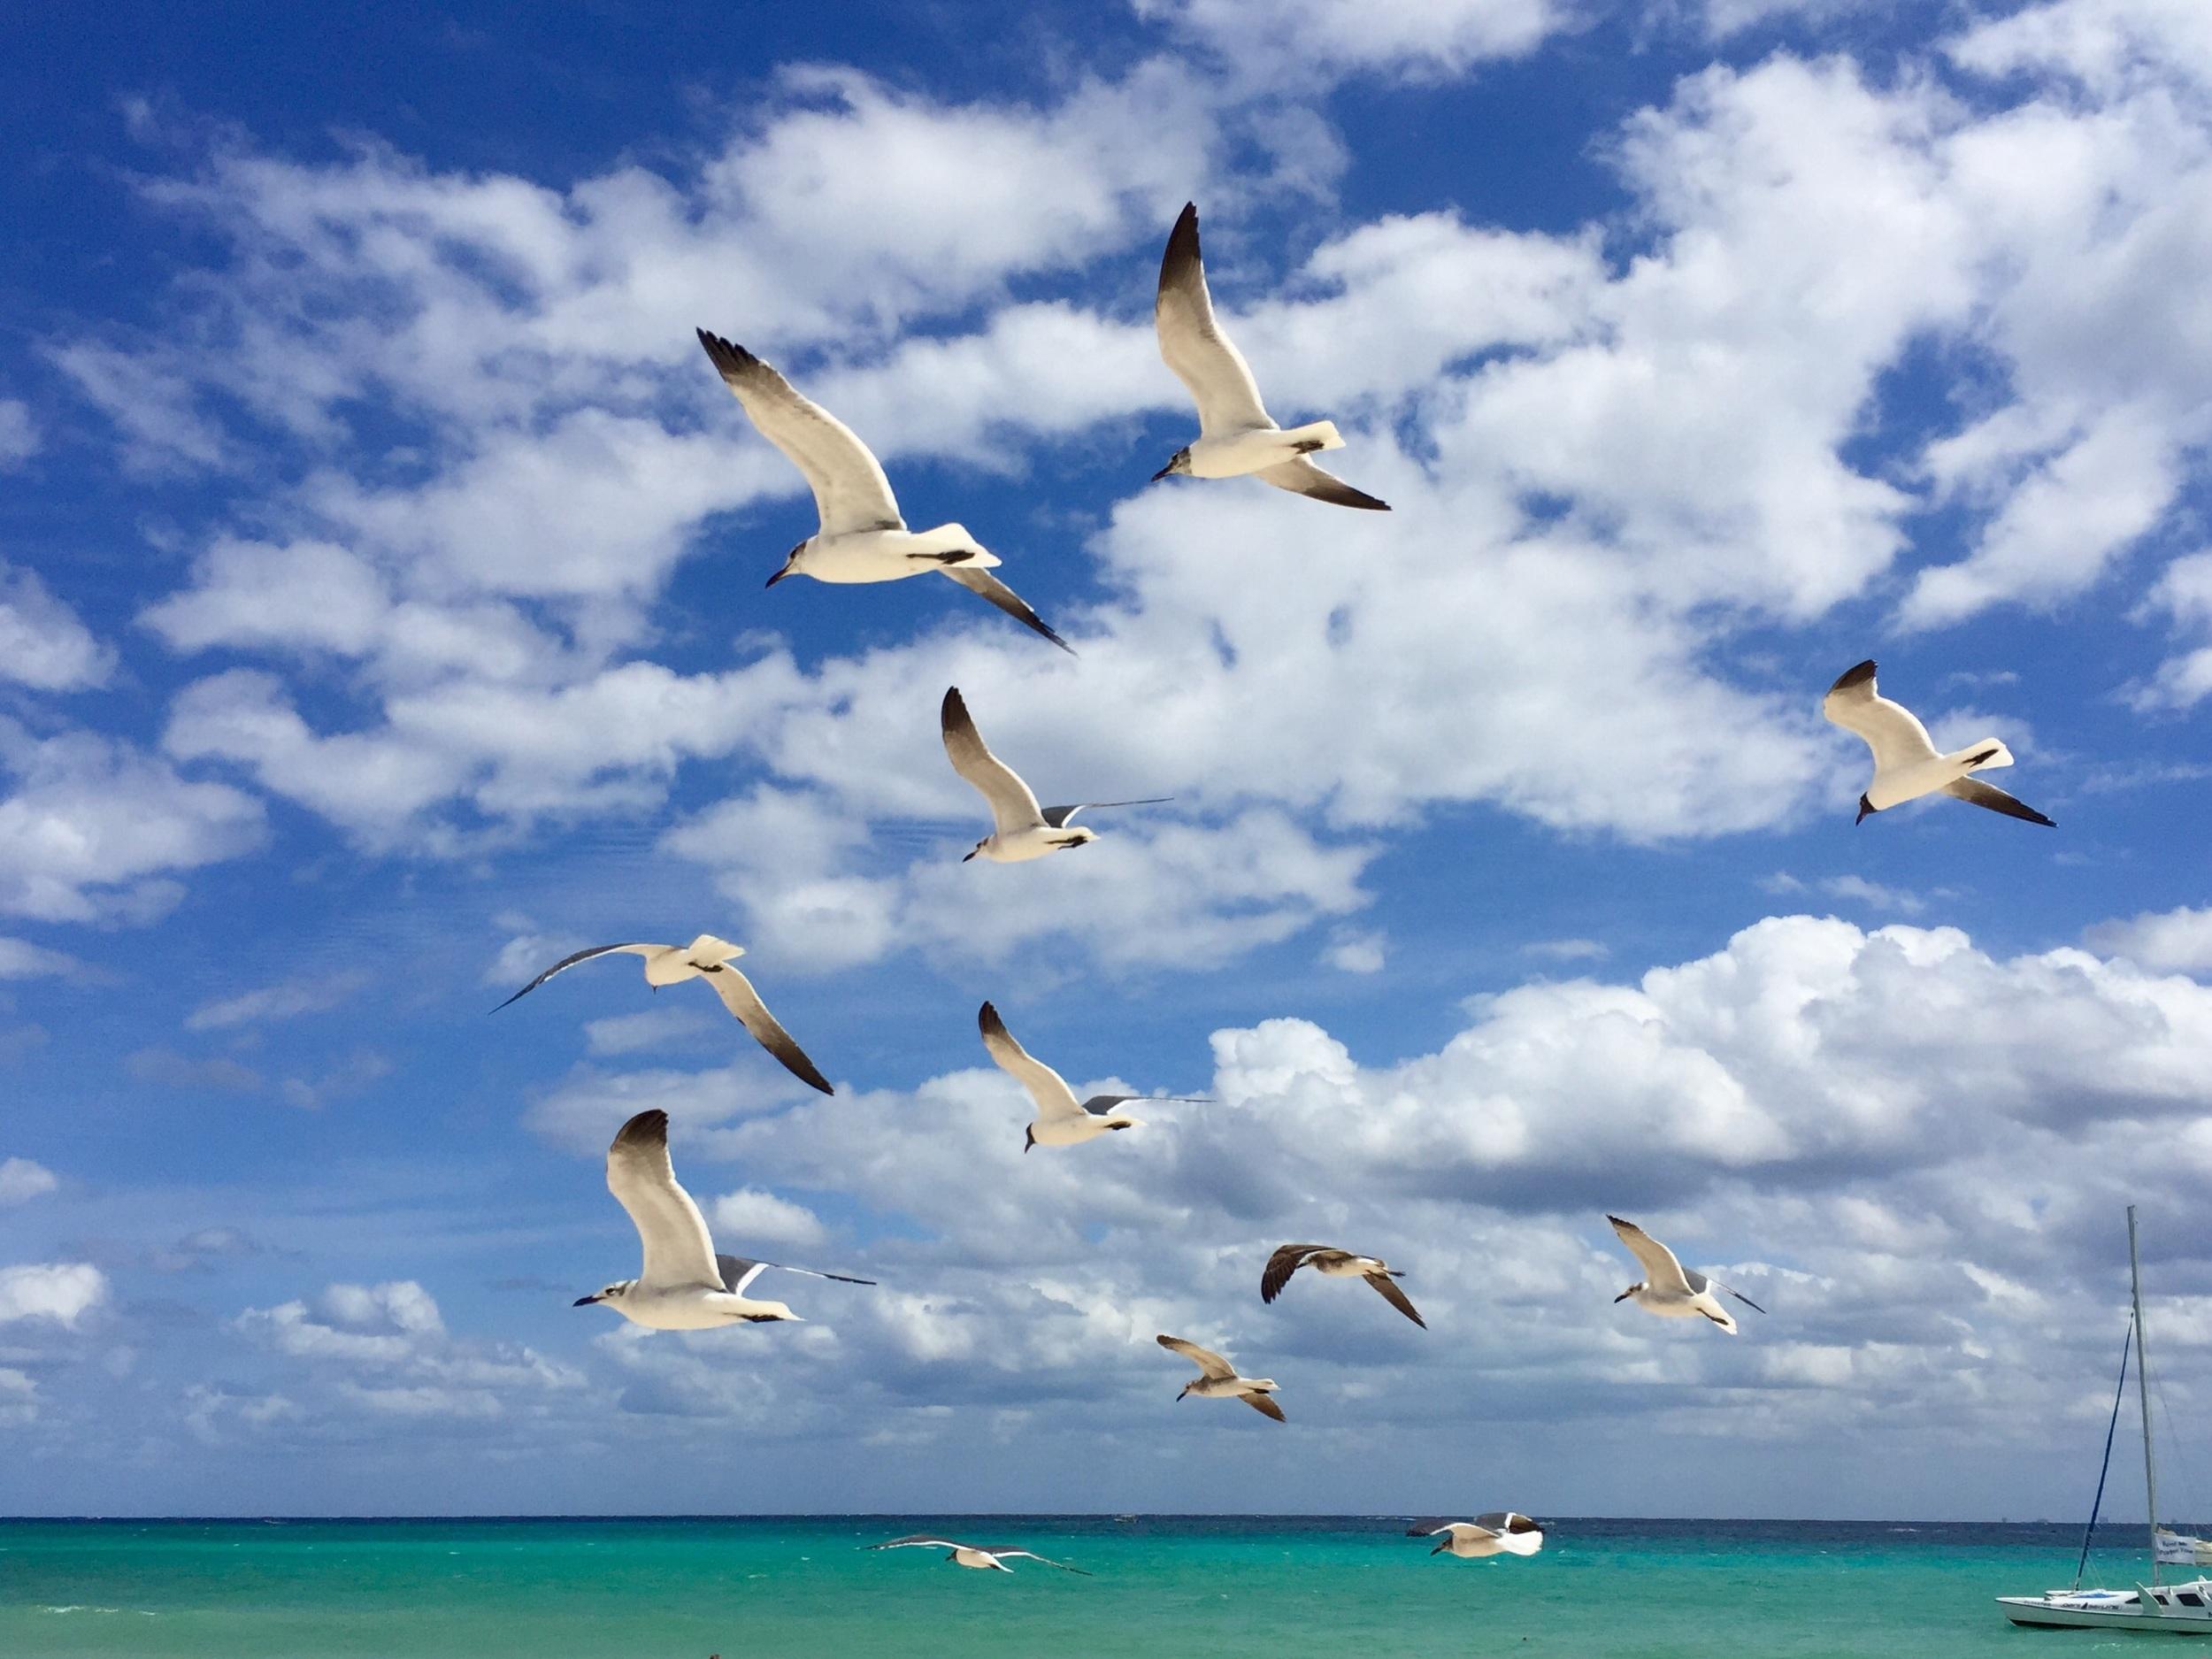 Arriving in Playa Del Carmen!